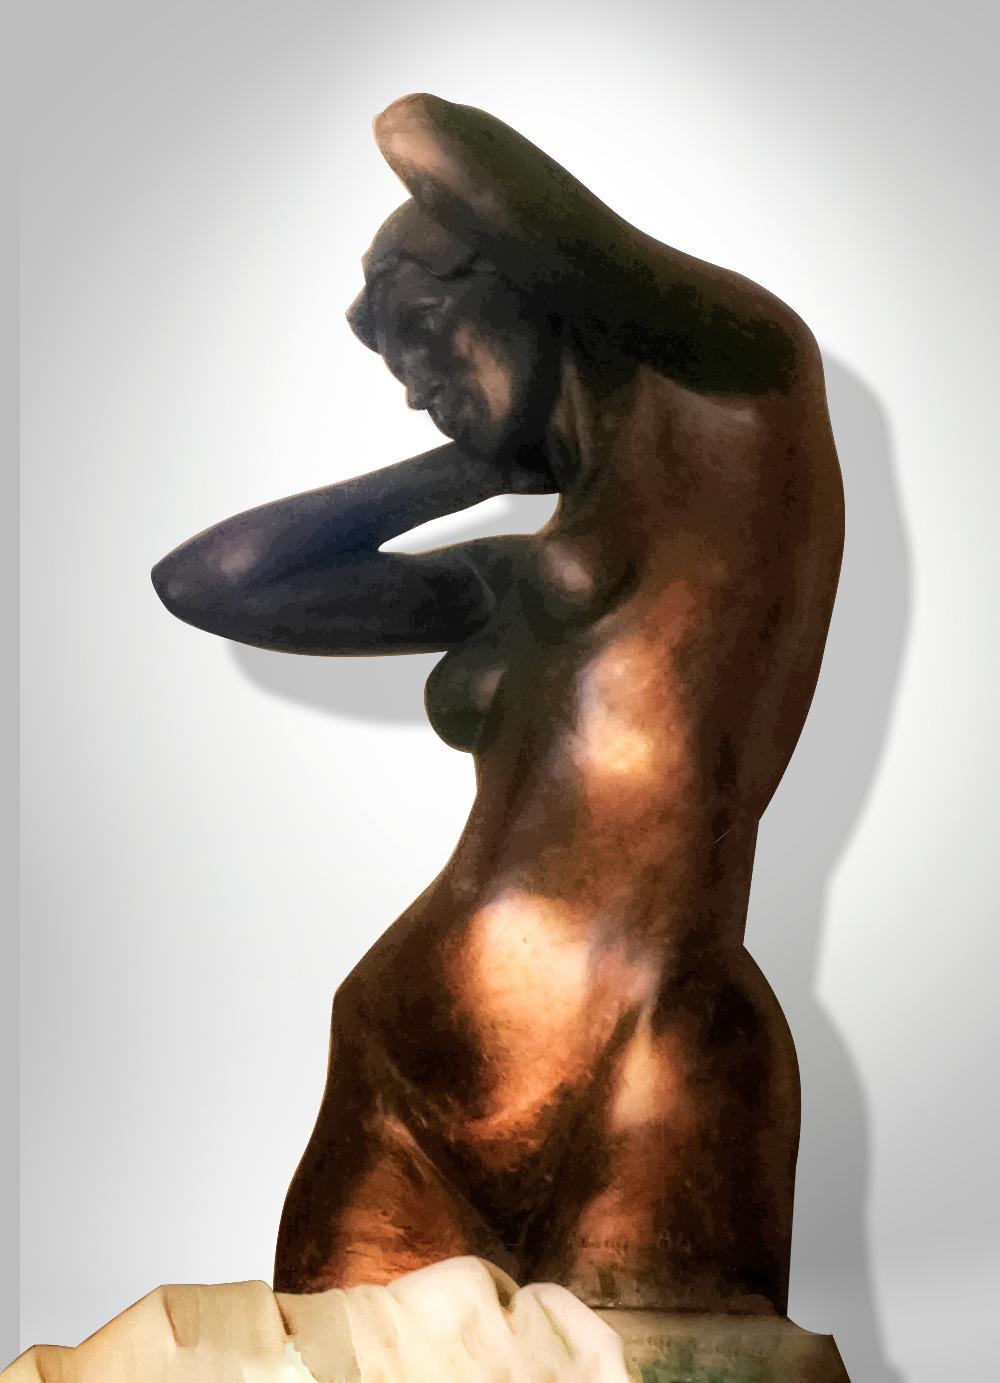 Escultura-Femenina-Bronce-A-Figurativo-Realista-RD.Escultor